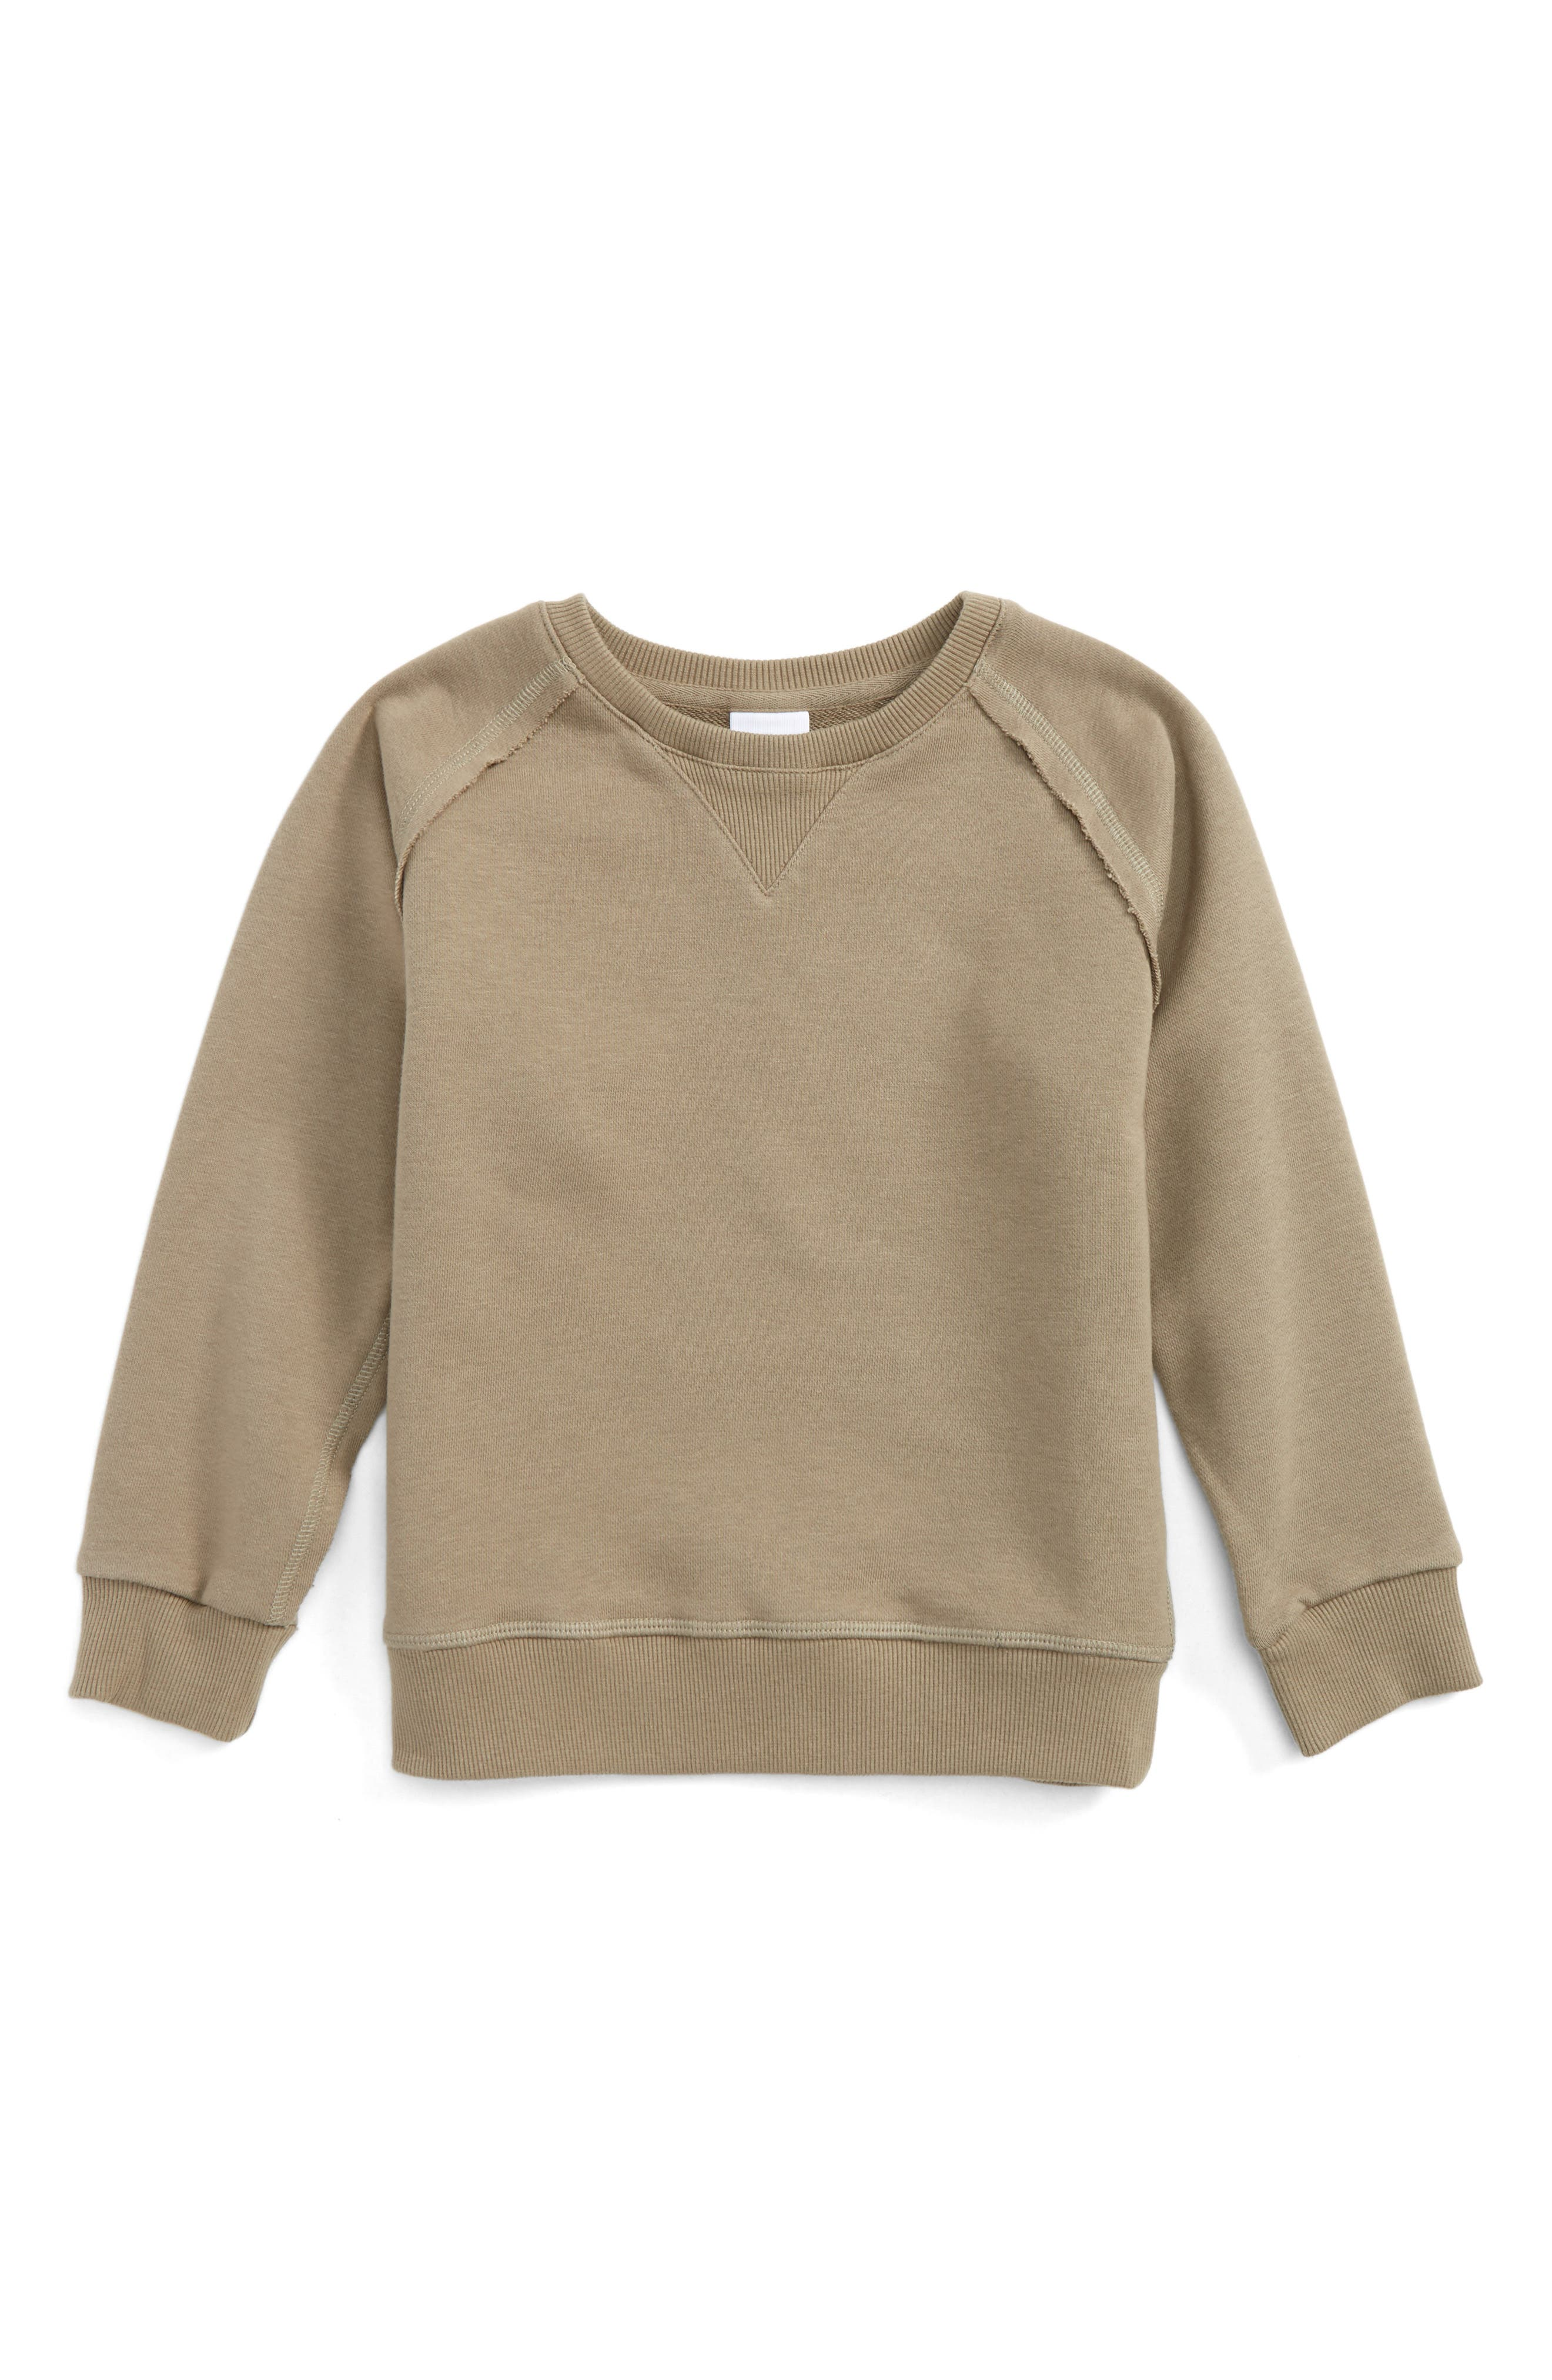 Alternate Image 1 Selected - Superism Raglan Sleeve Sweatshirt (Toddler Boys & Little Boys)